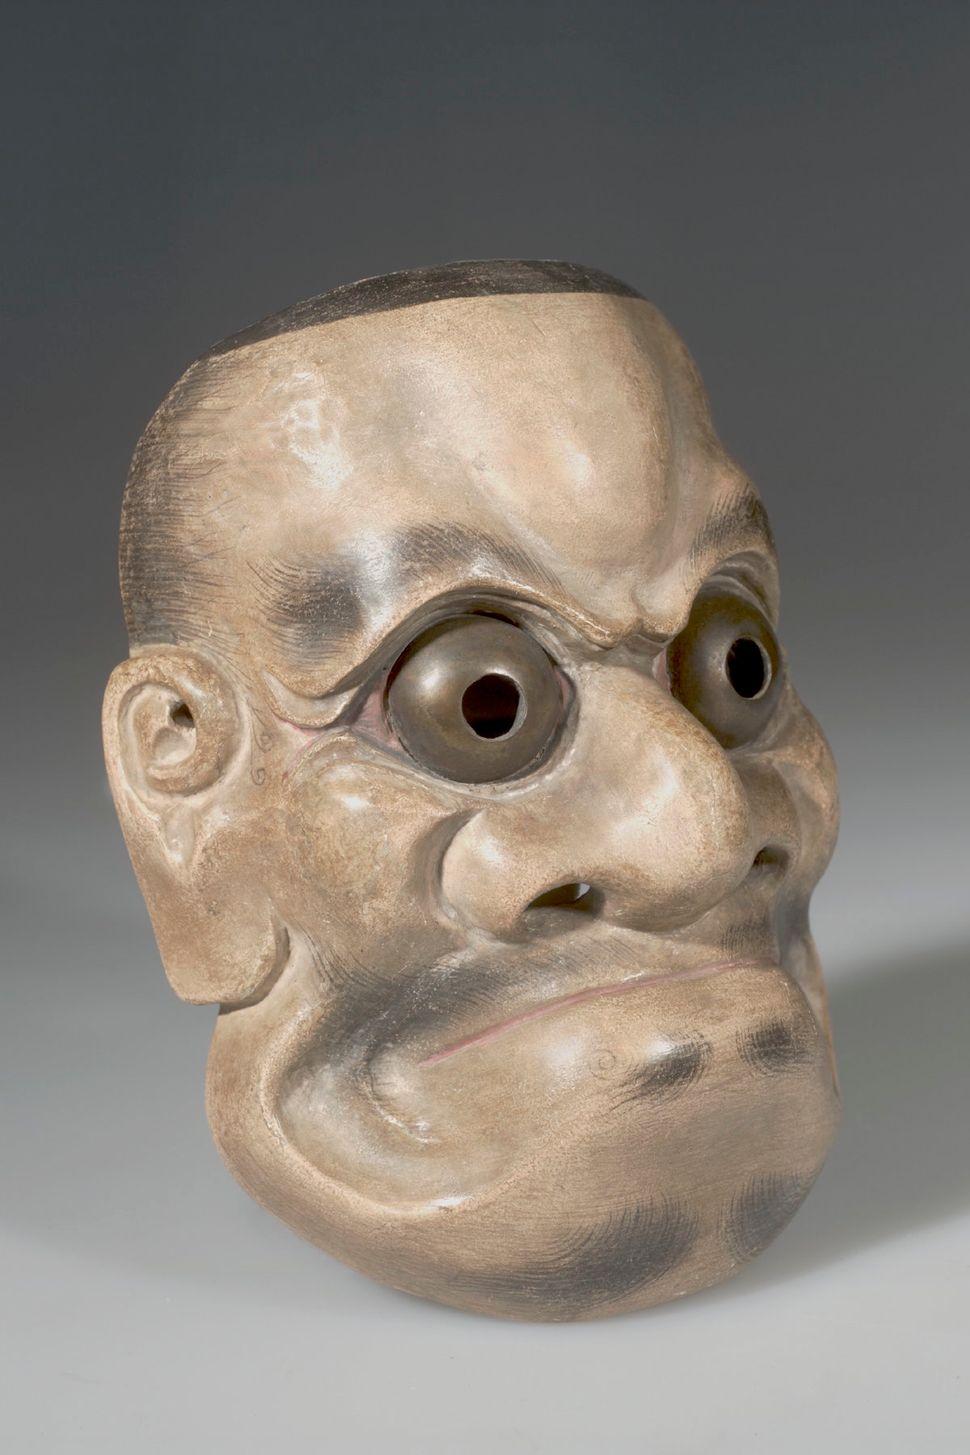 Noh Drama Mask, Beshimi (Tight Lip), American Museum of Natural History